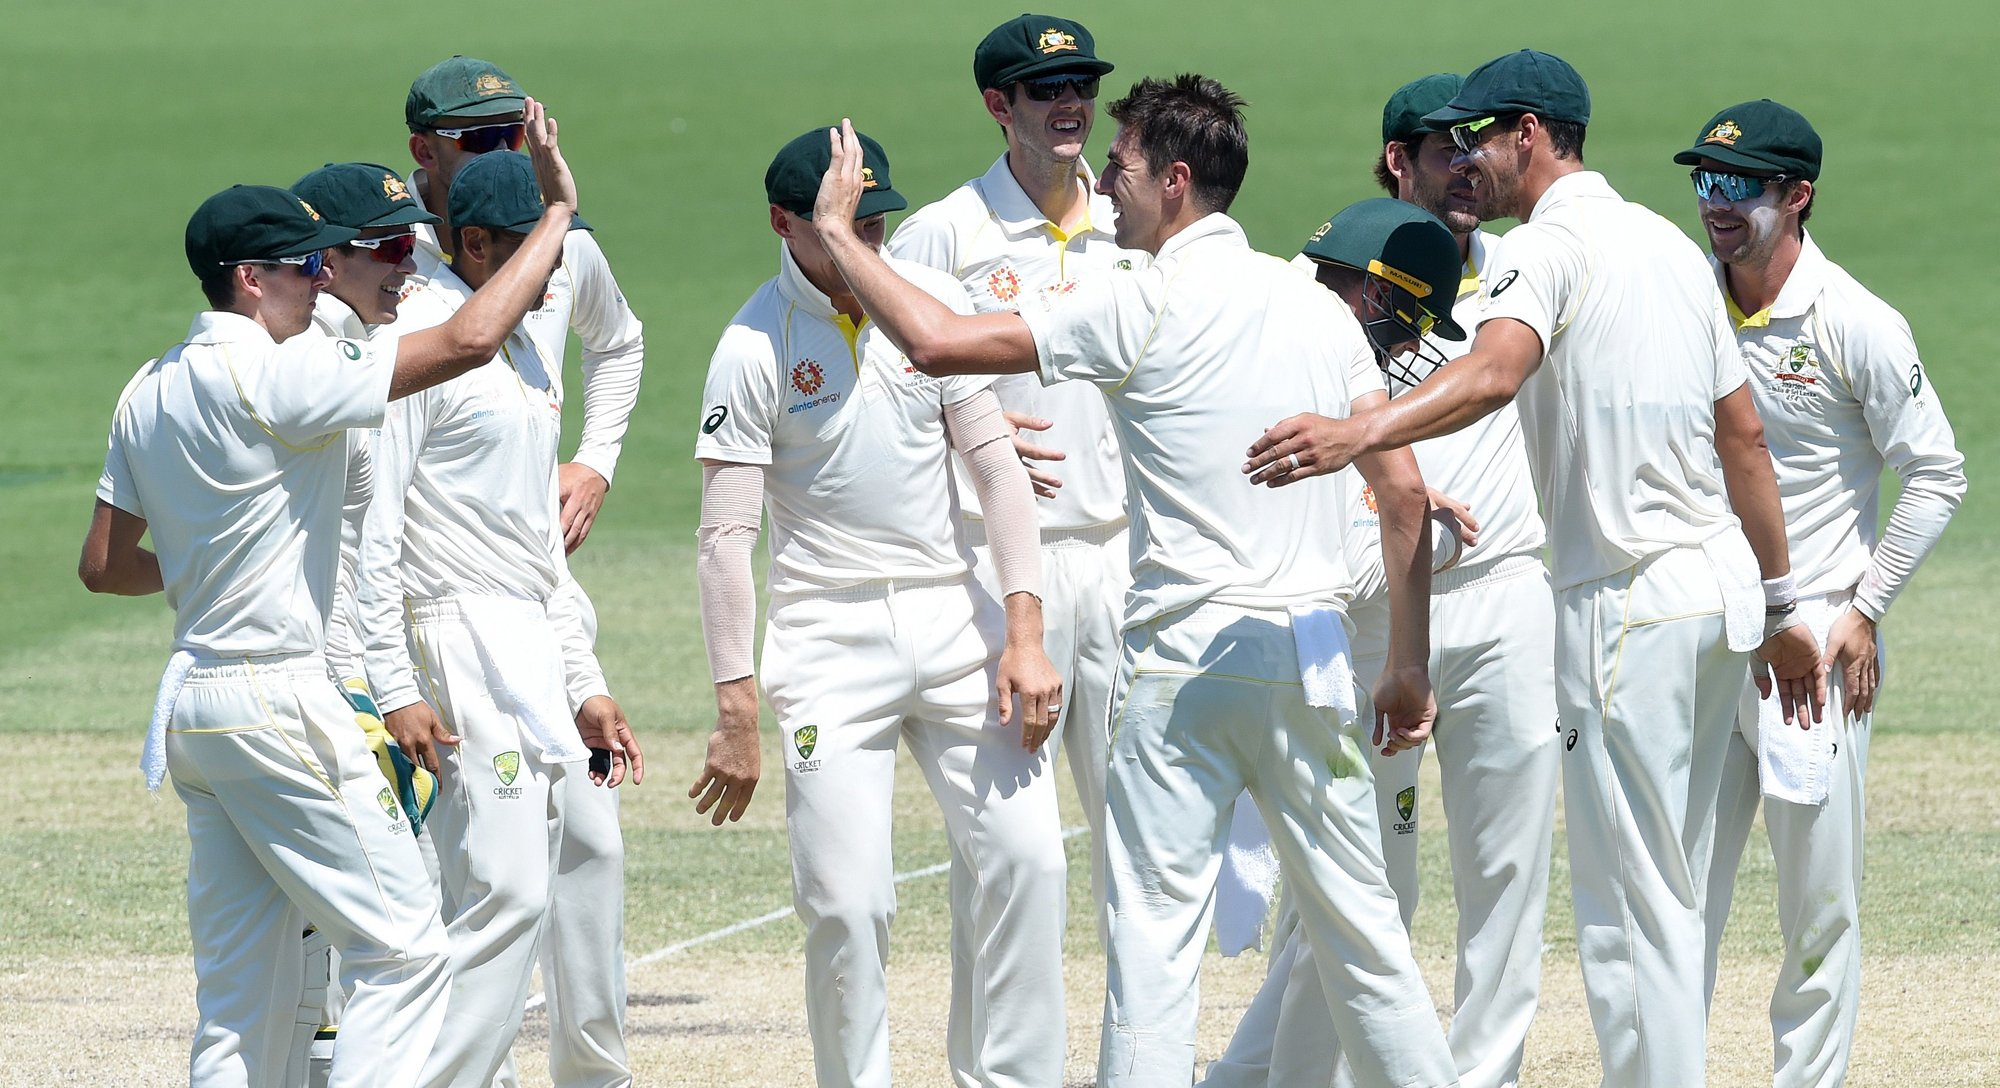 australia beat sri lanka by 366 runs to win second test and series